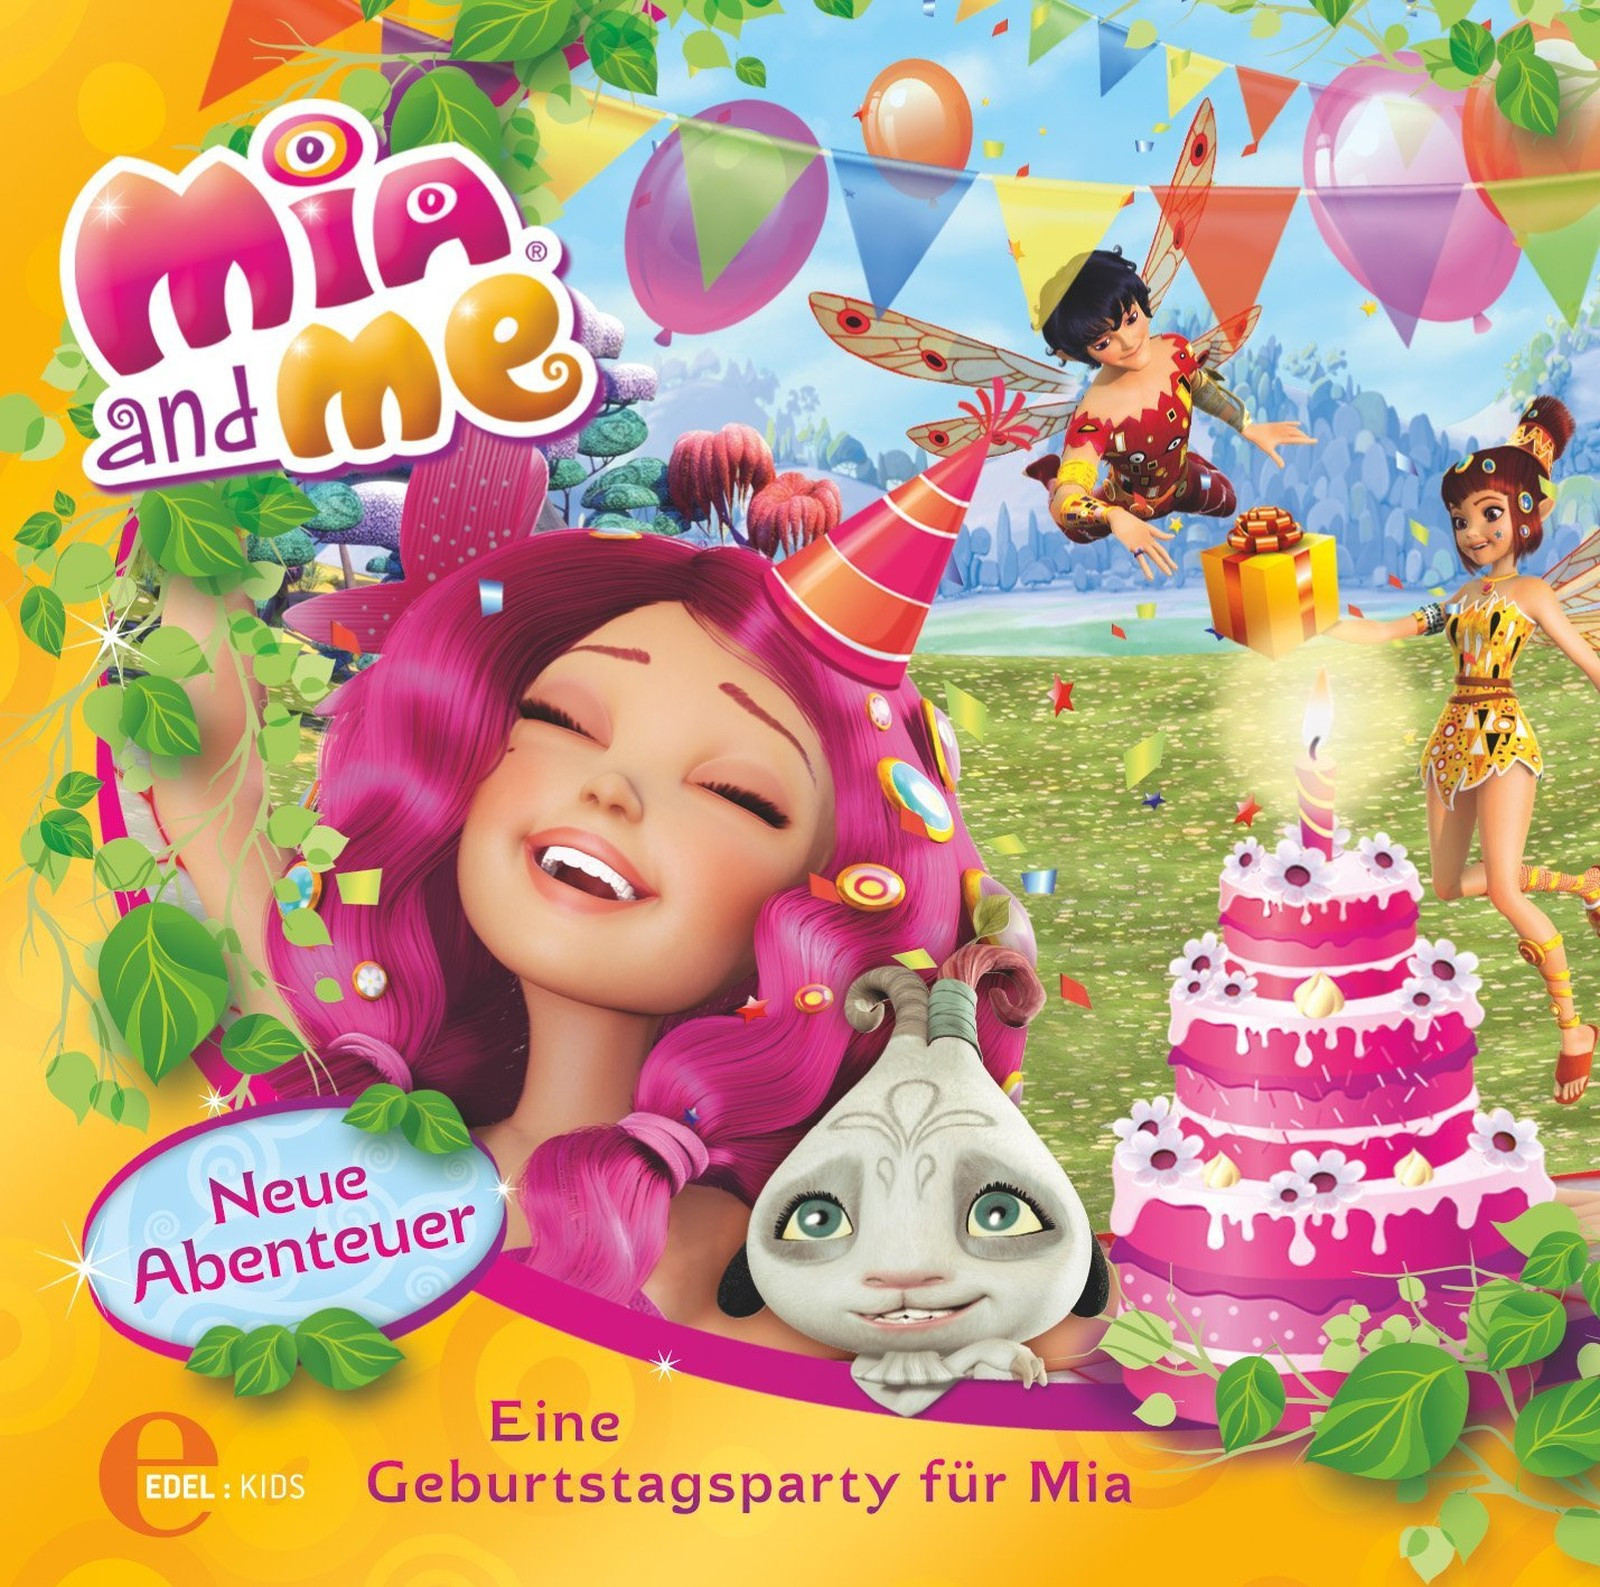 Mia and me - Folge 3: Eine Geburtstagsparty für Mia